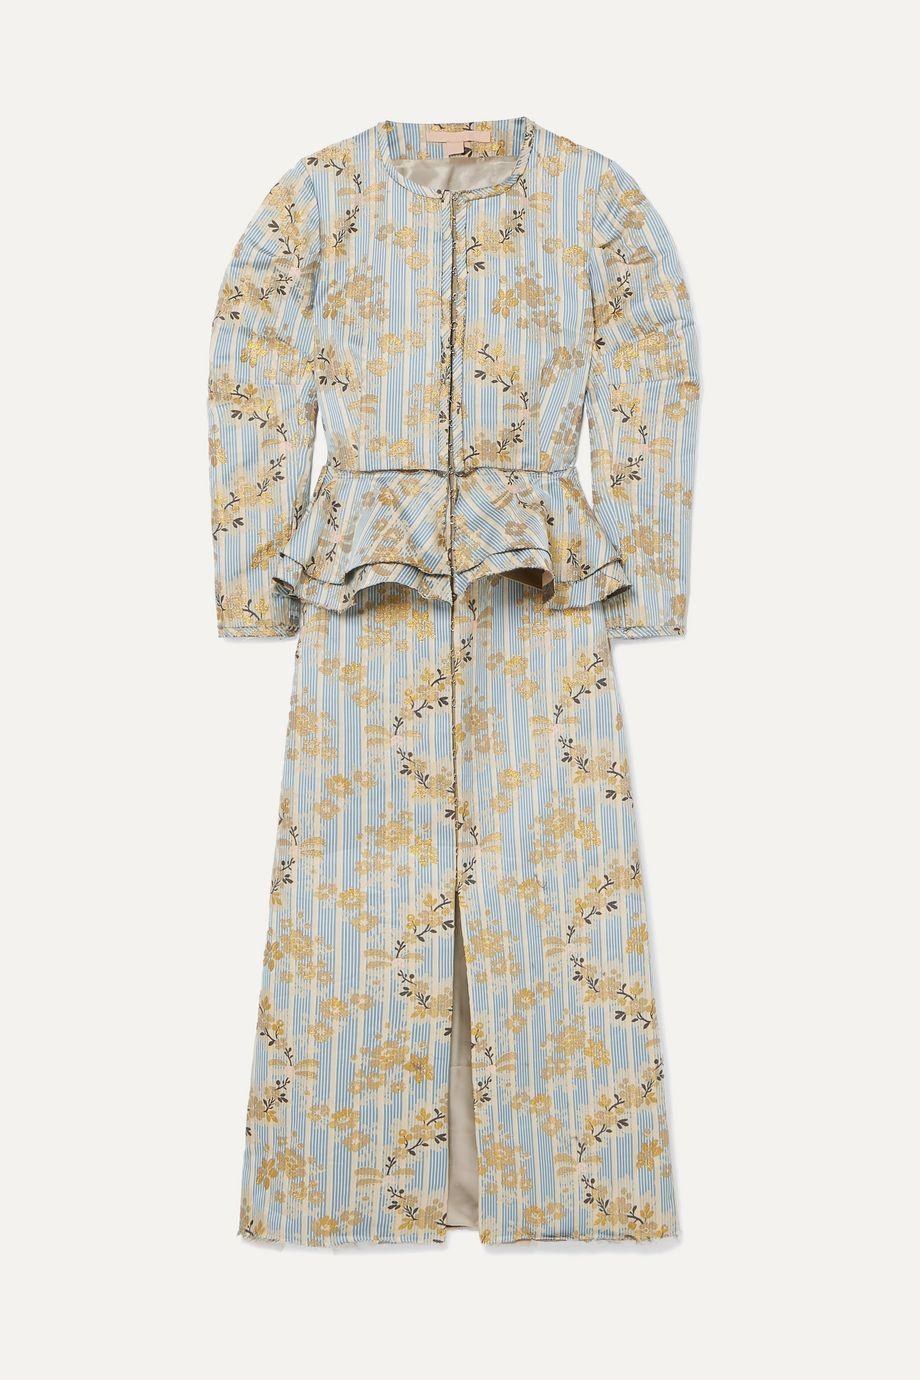 Brock Collection Metallic brocade peplum midi dress